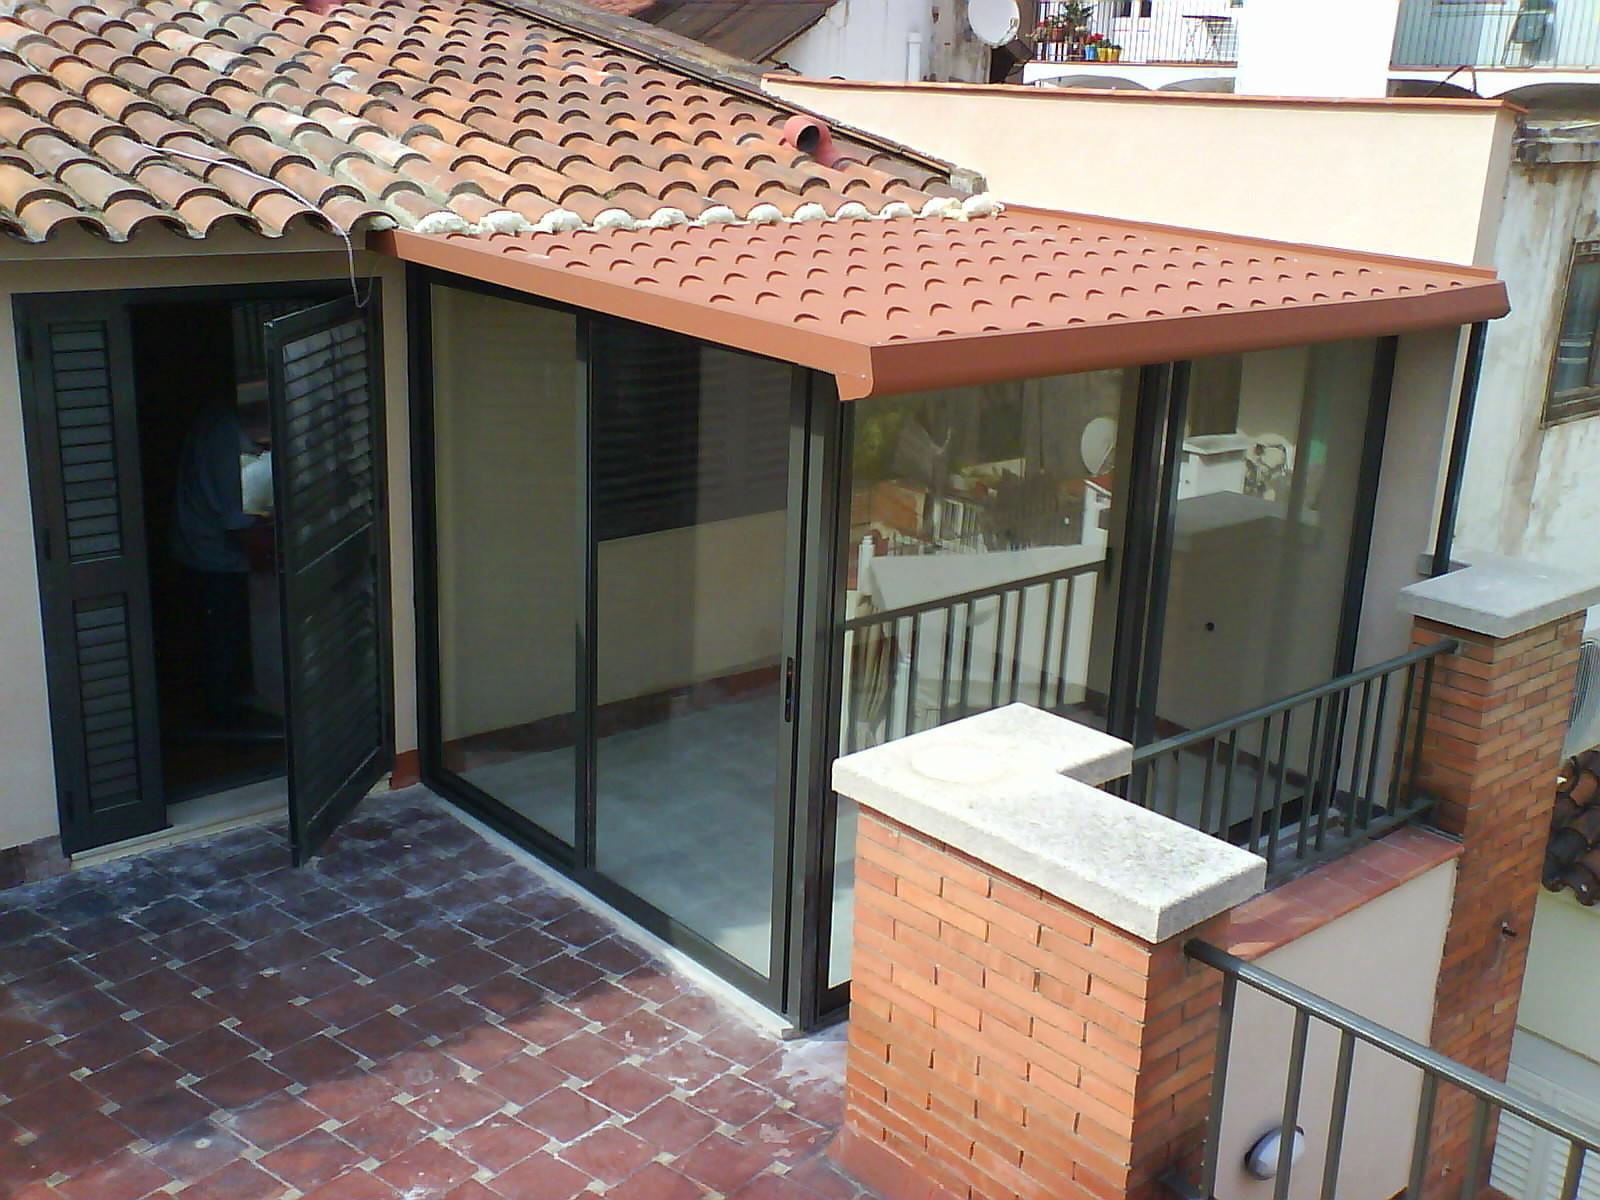 Cerramiento terraza carpinter a de aluminio barcelona for Techos de tejas para patios exteriores